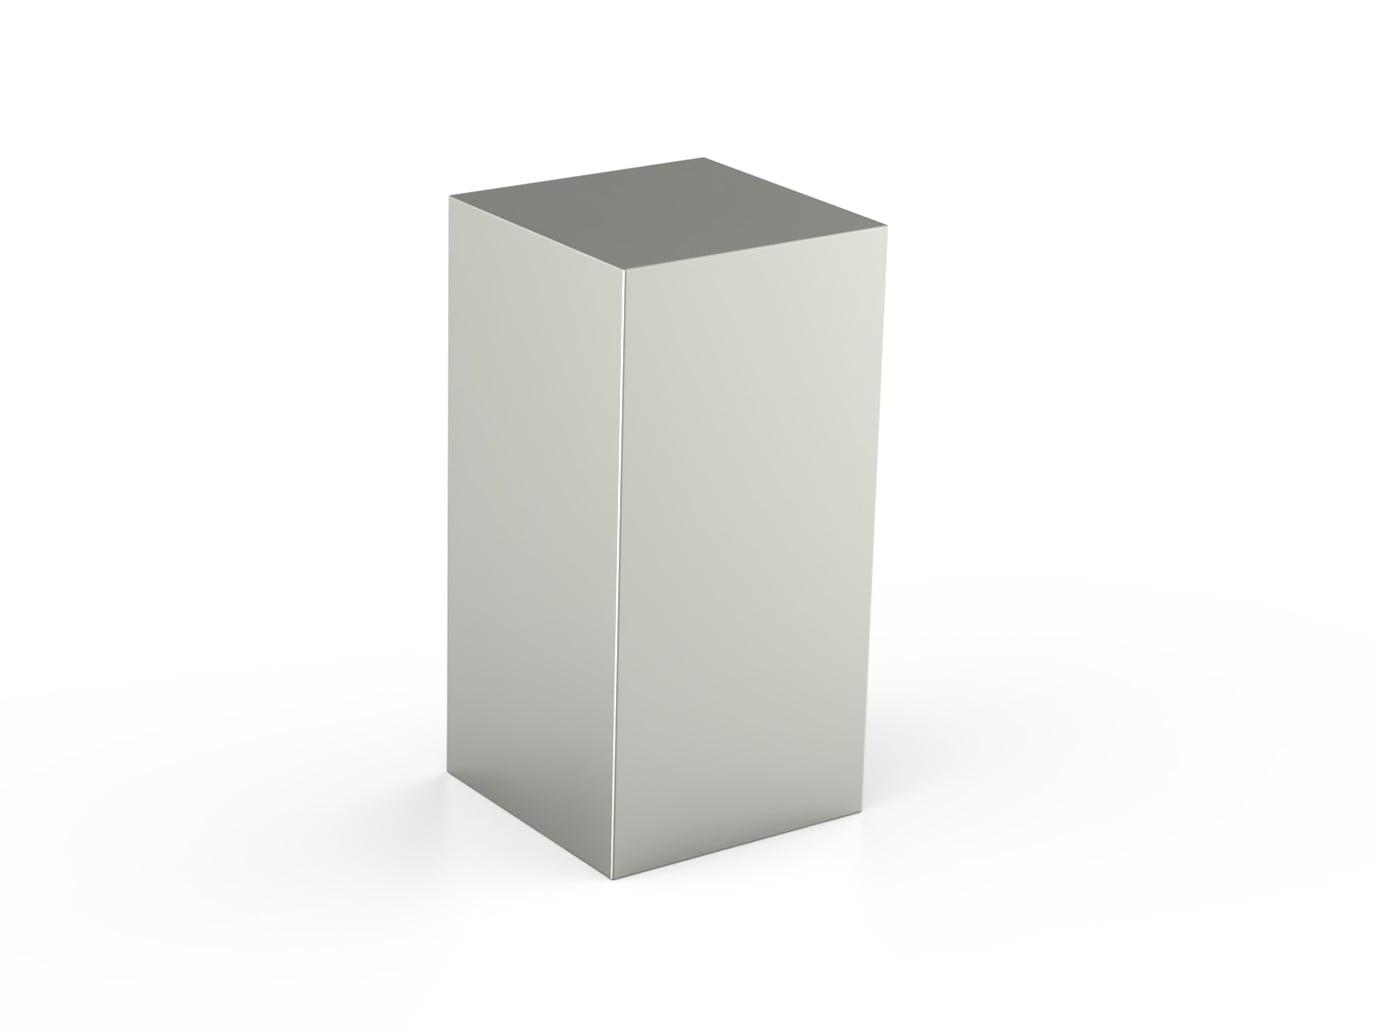 rvs urn pilaar rechthoek